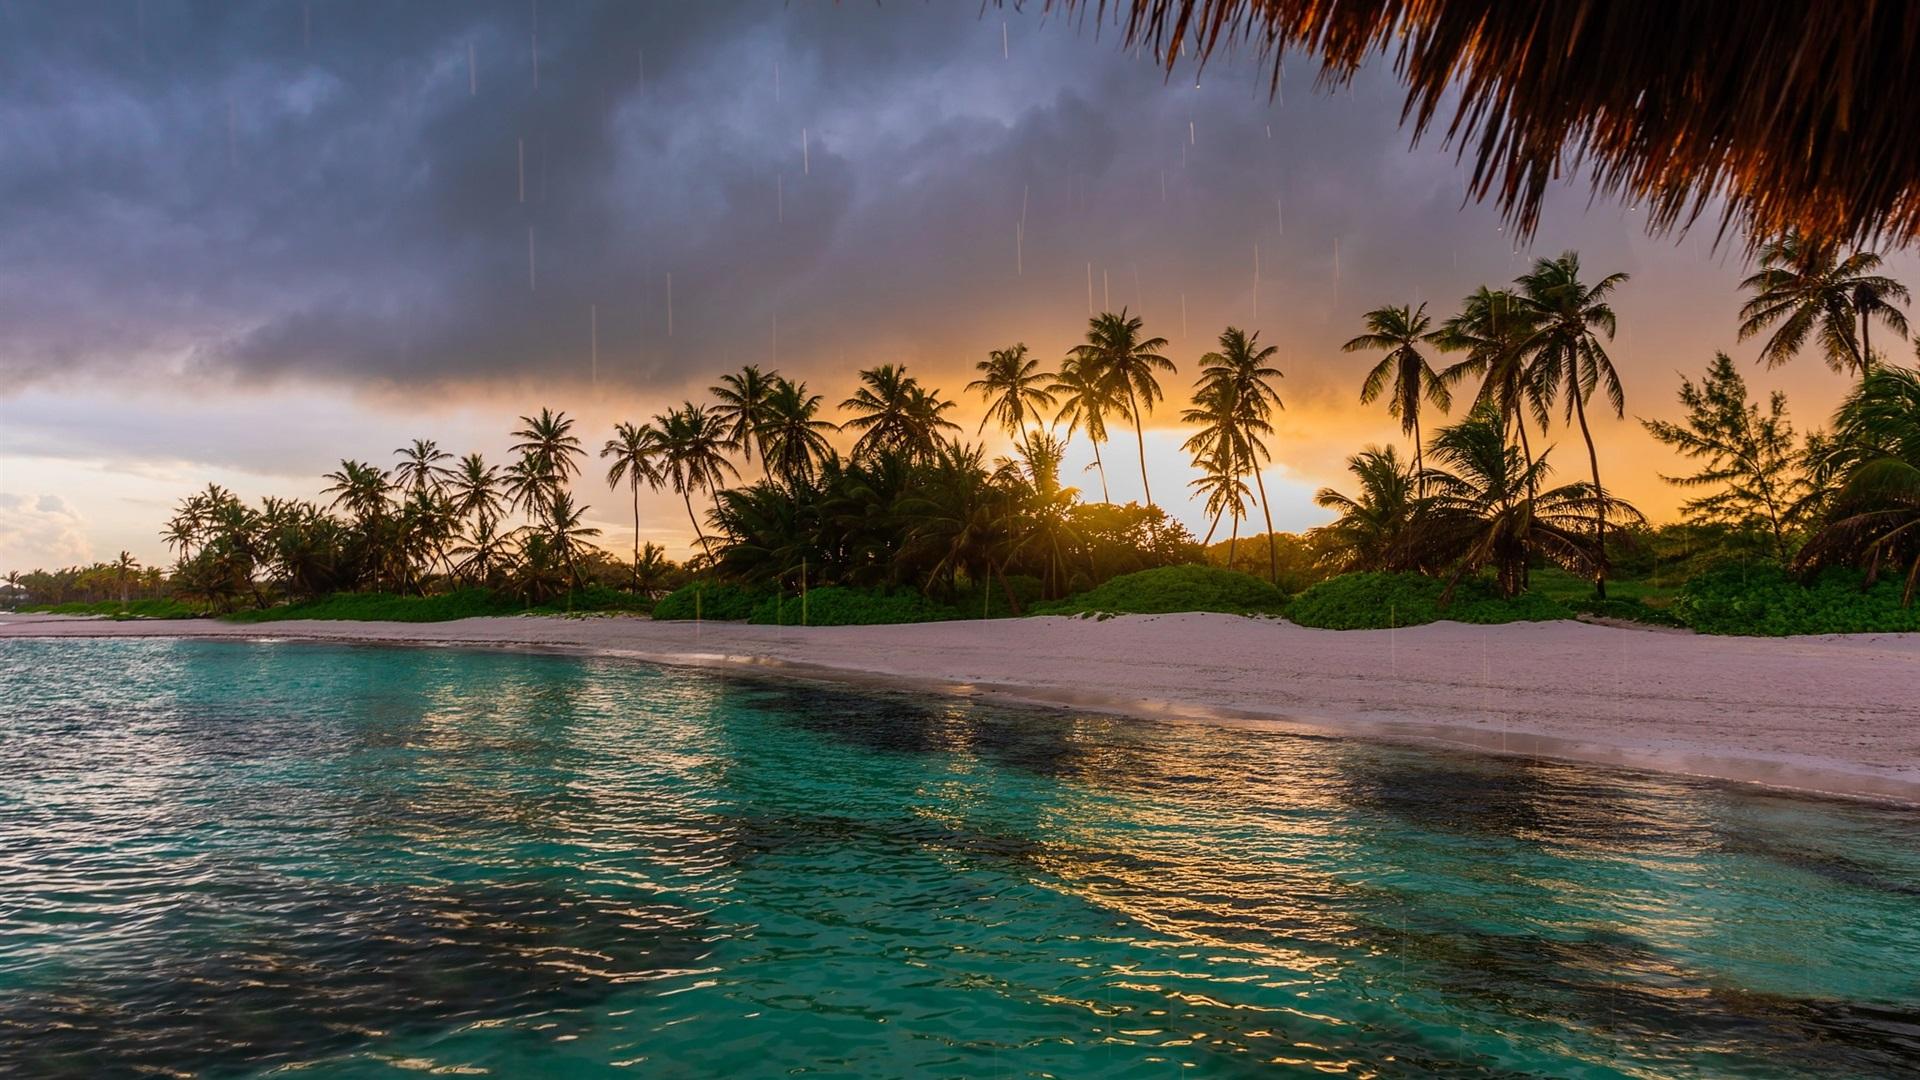 Wallpaper Caribbean Sea Beach Sunset Palm Trees Hd 5k: 배경 화면 해변, 야자수, 바다, 일몰 1920x1200 HD 그림, 이미지